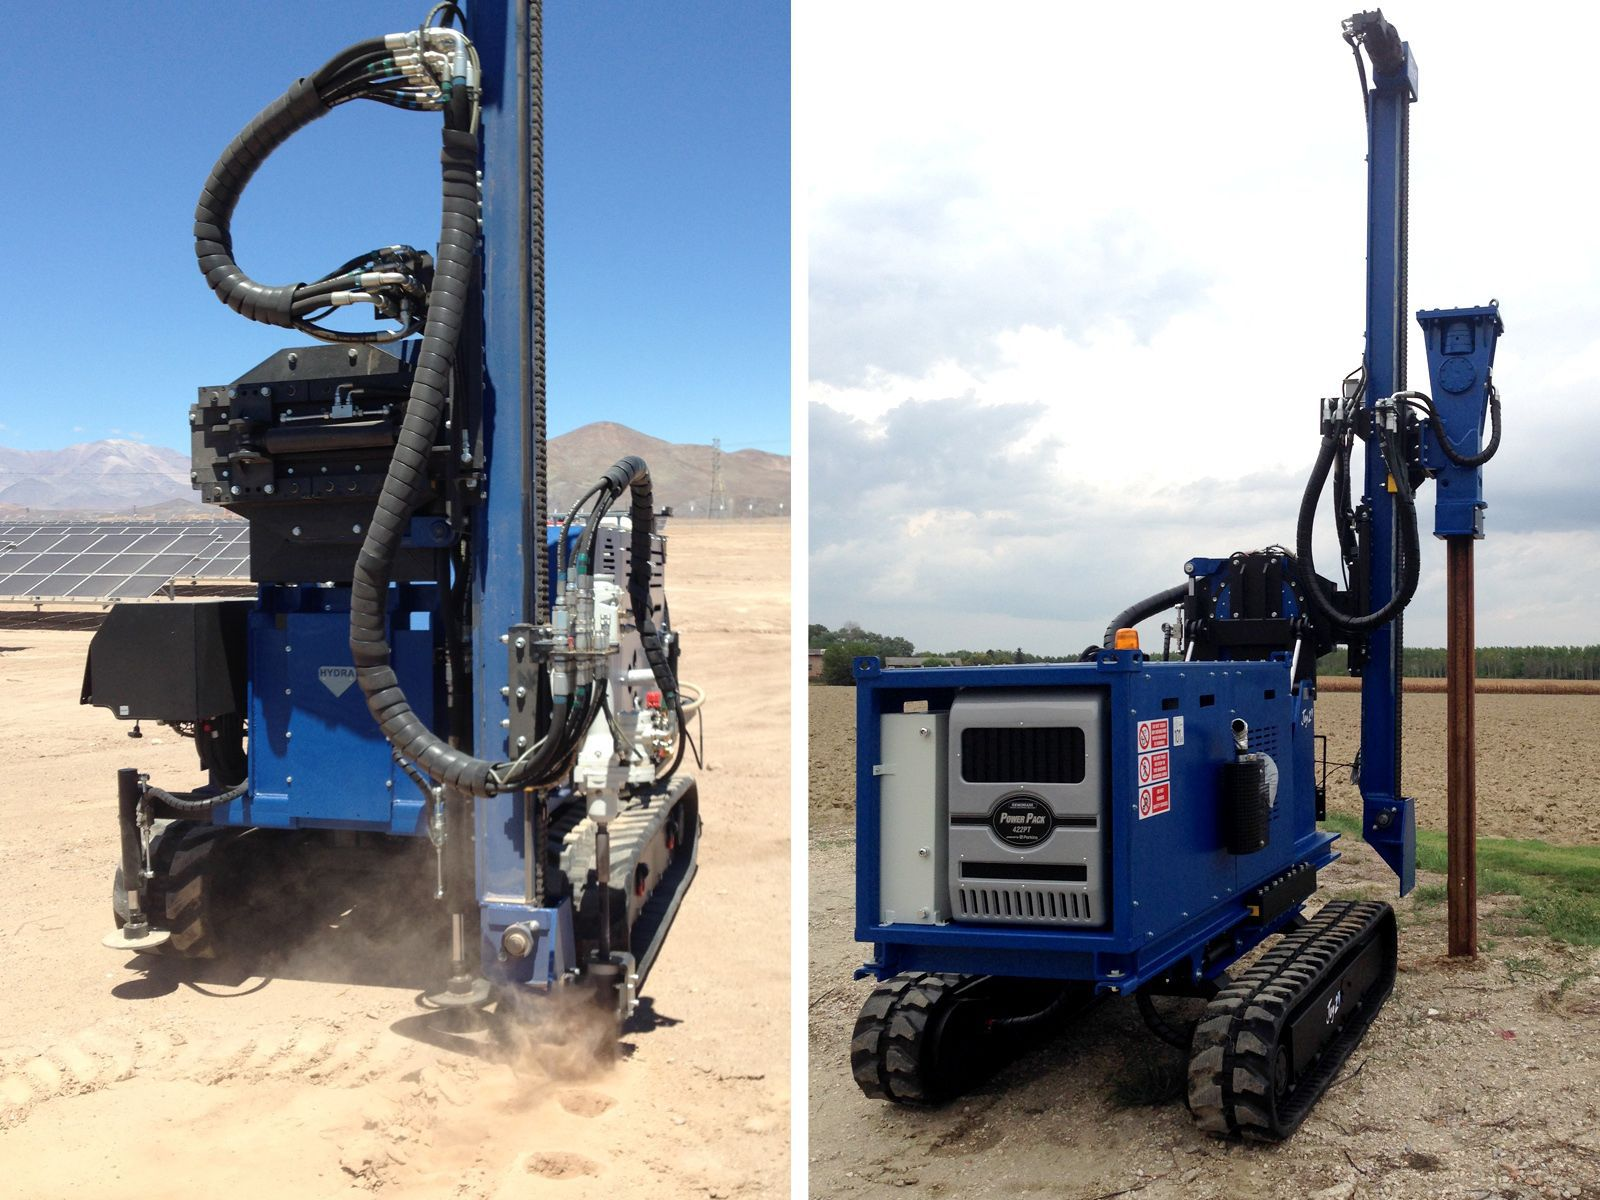 Piling drilling rig / crawler / tophammer / rotary - JOY 2 SOLAR